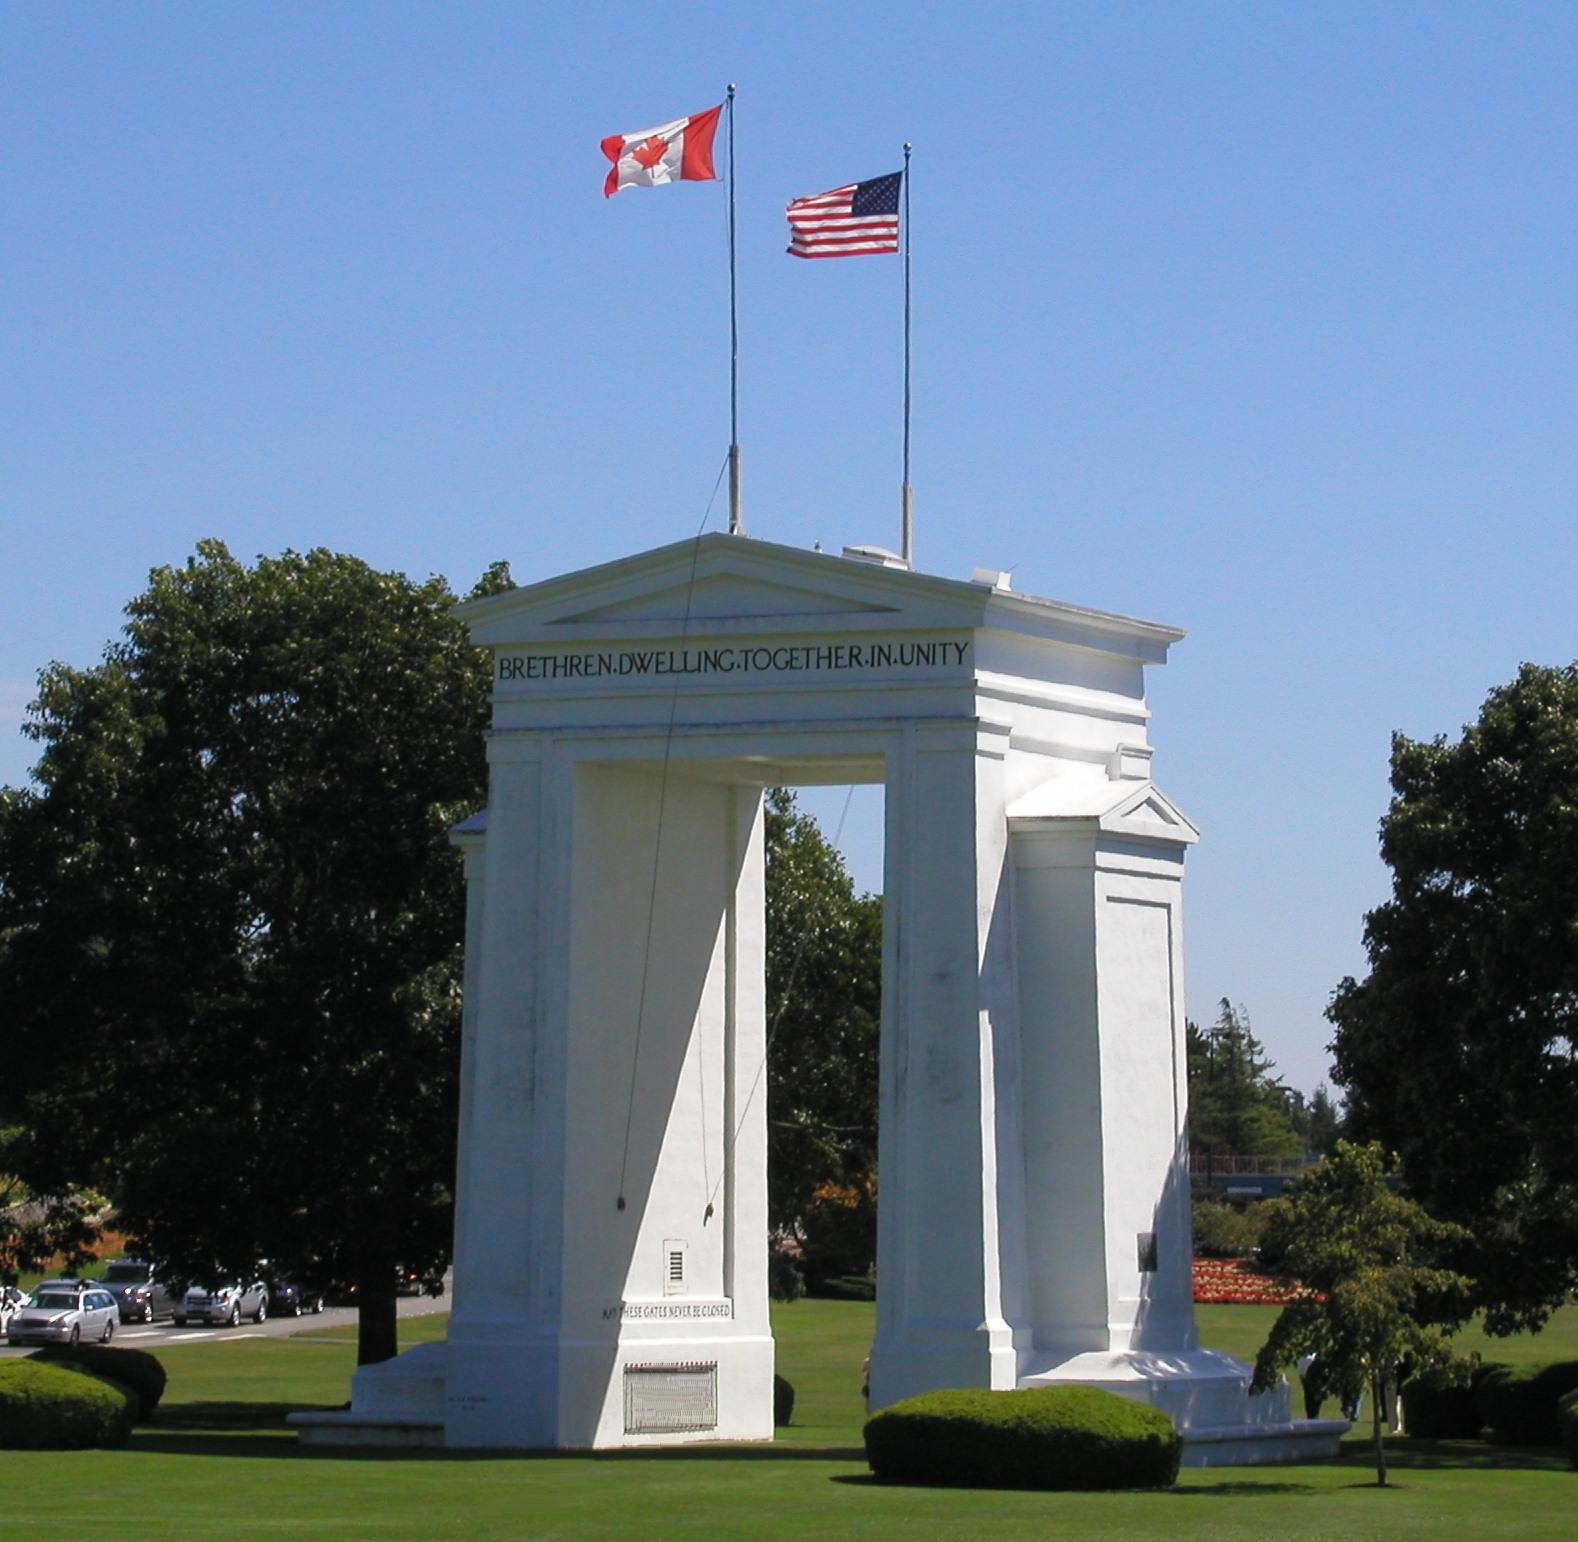 Canadaunited States Border Wikipedia - Us-canada-border-crossing-map-locations